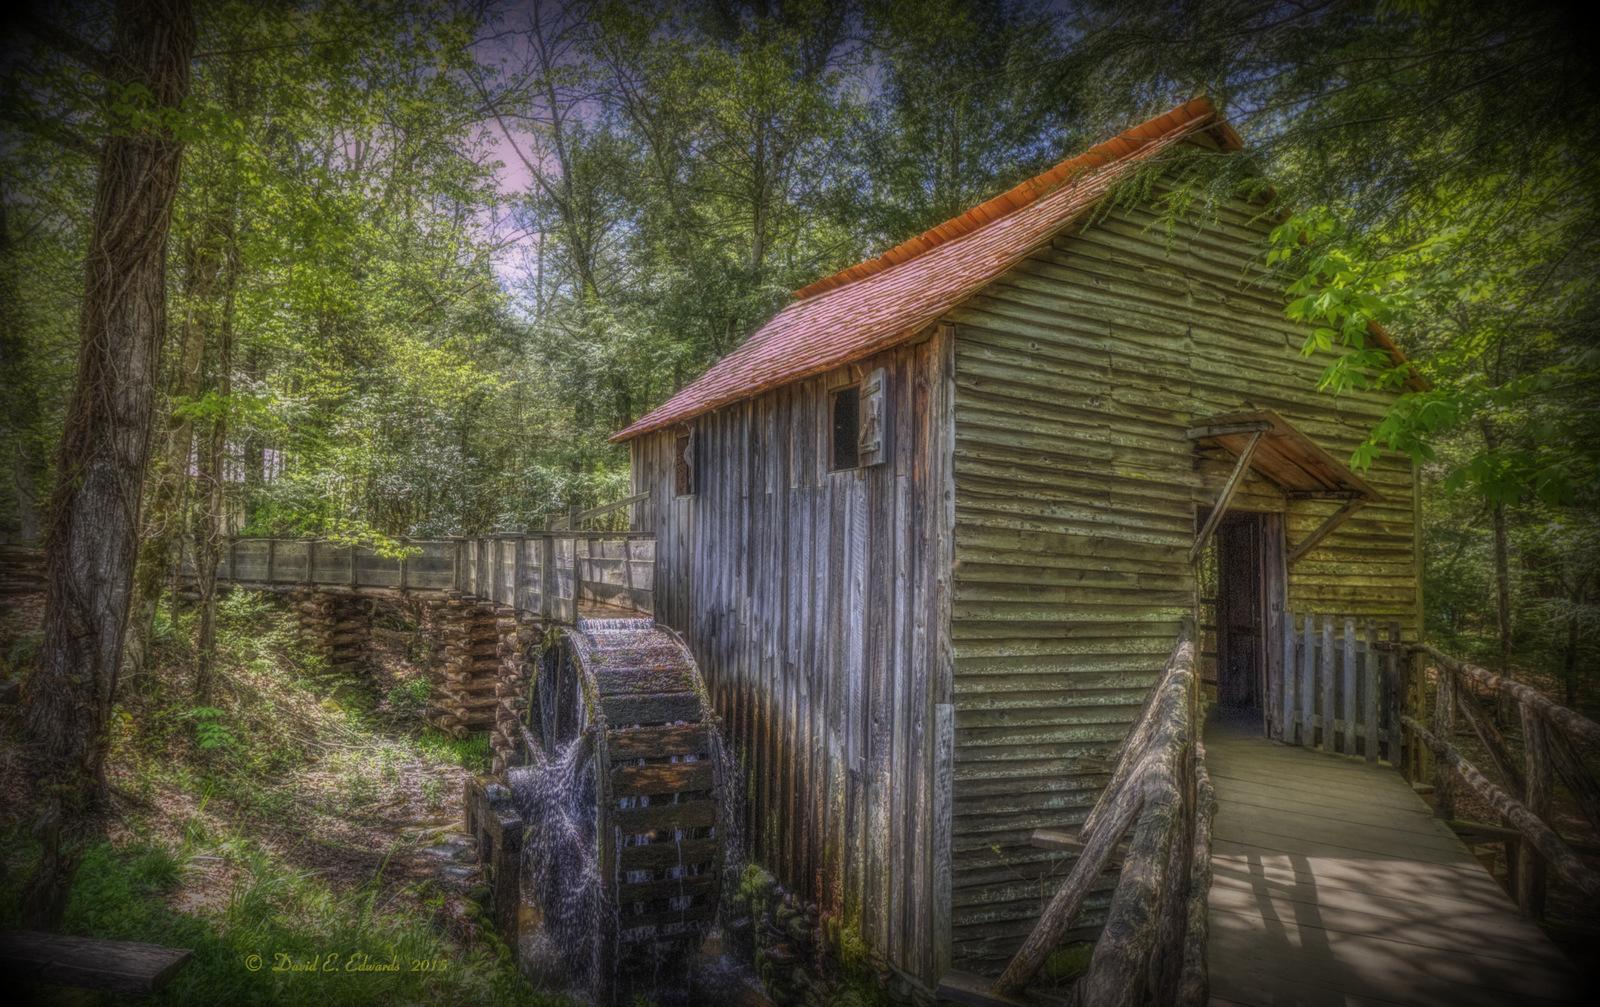 Mill at Cades Cove